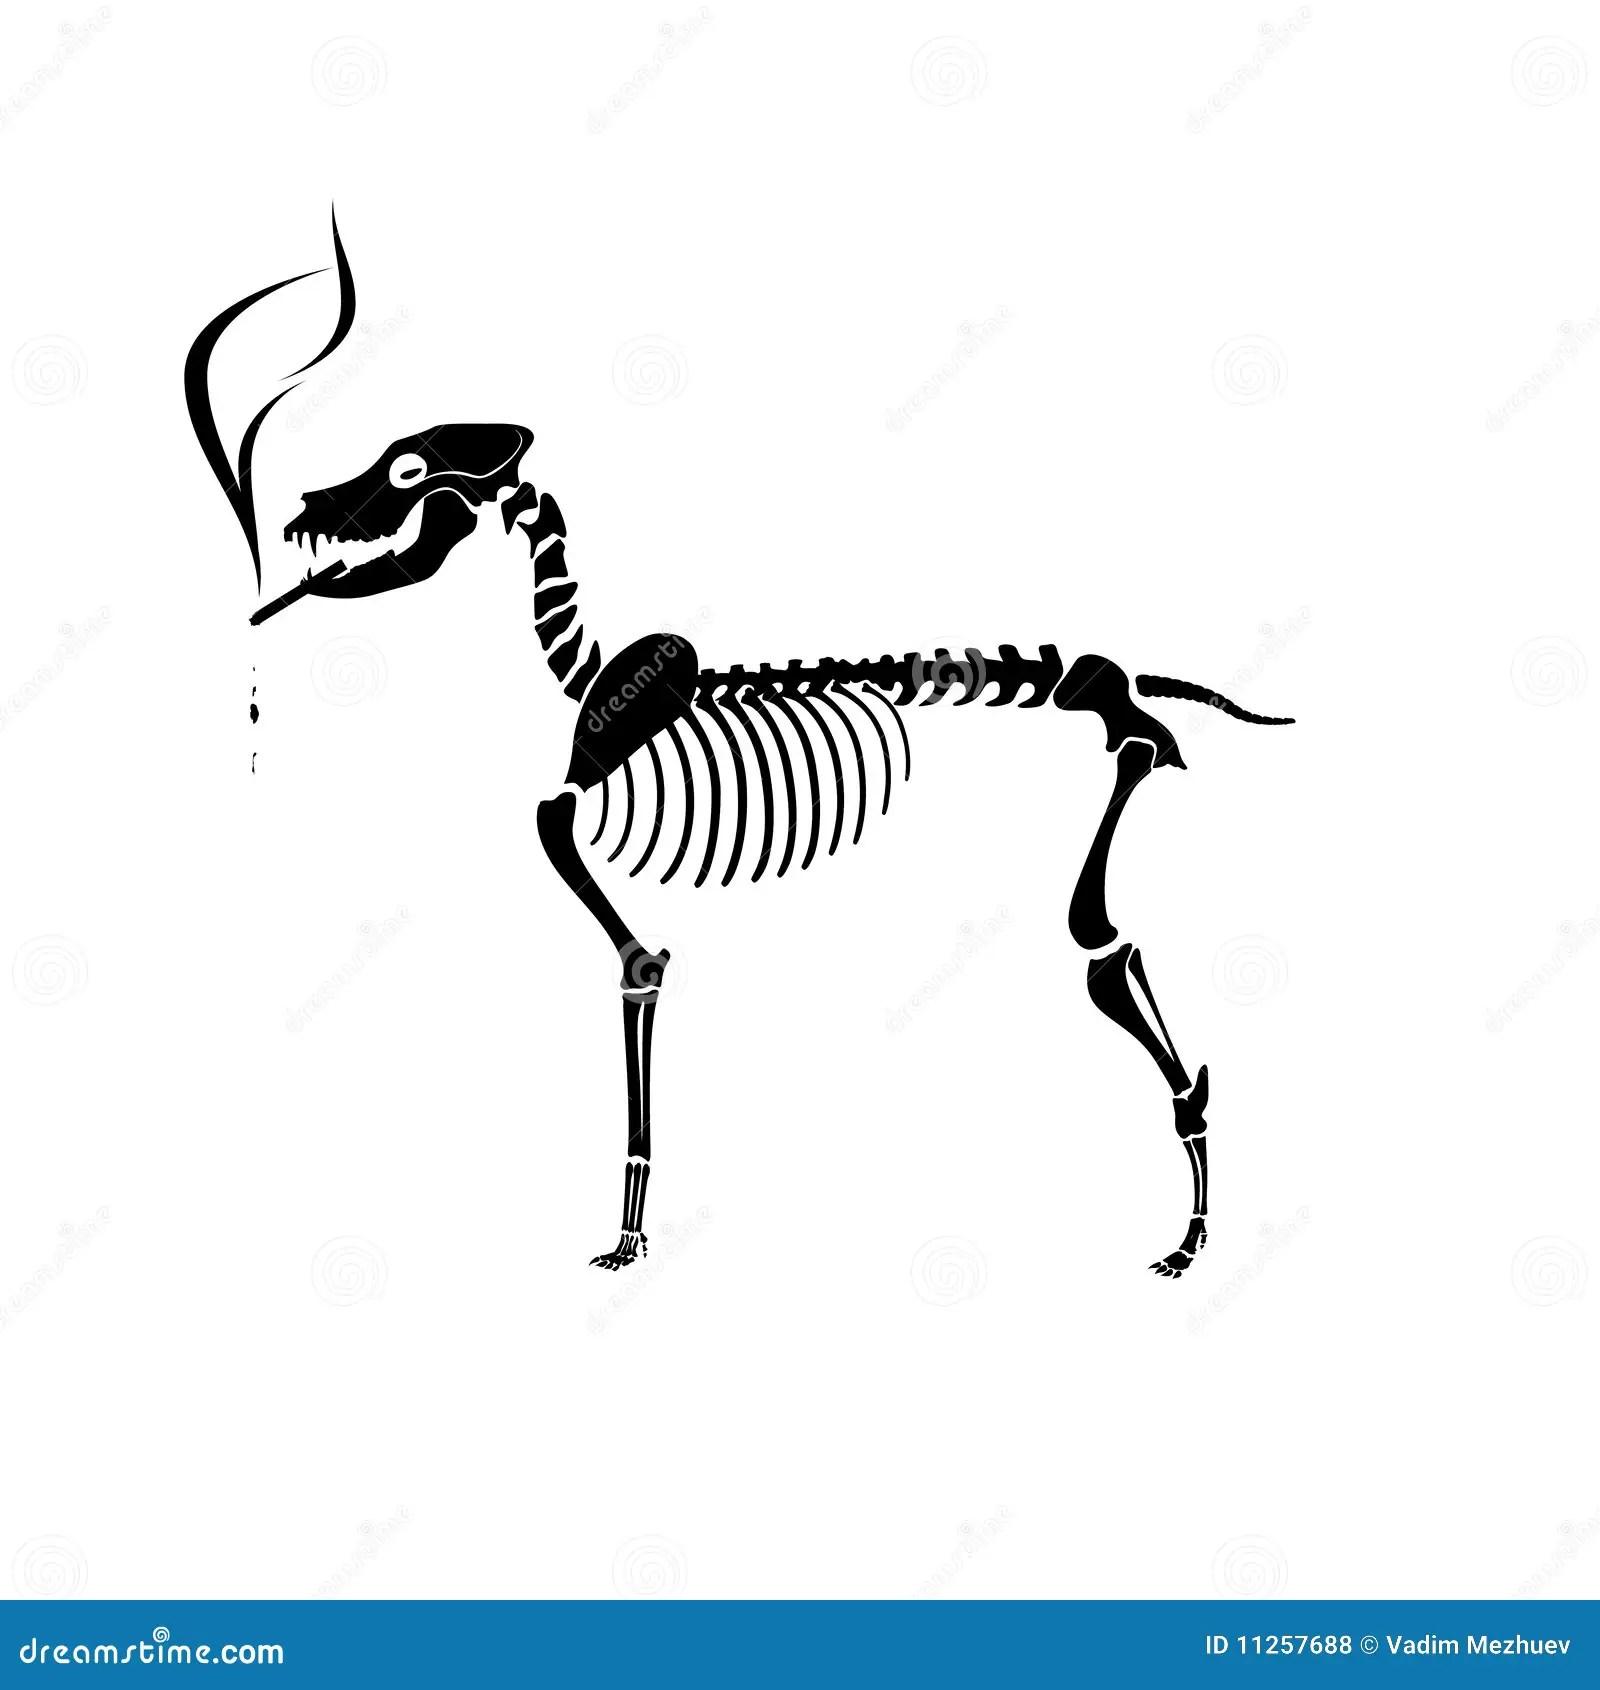 Smoking Dog Skeleton Stock Vector Illustration Of Graphic